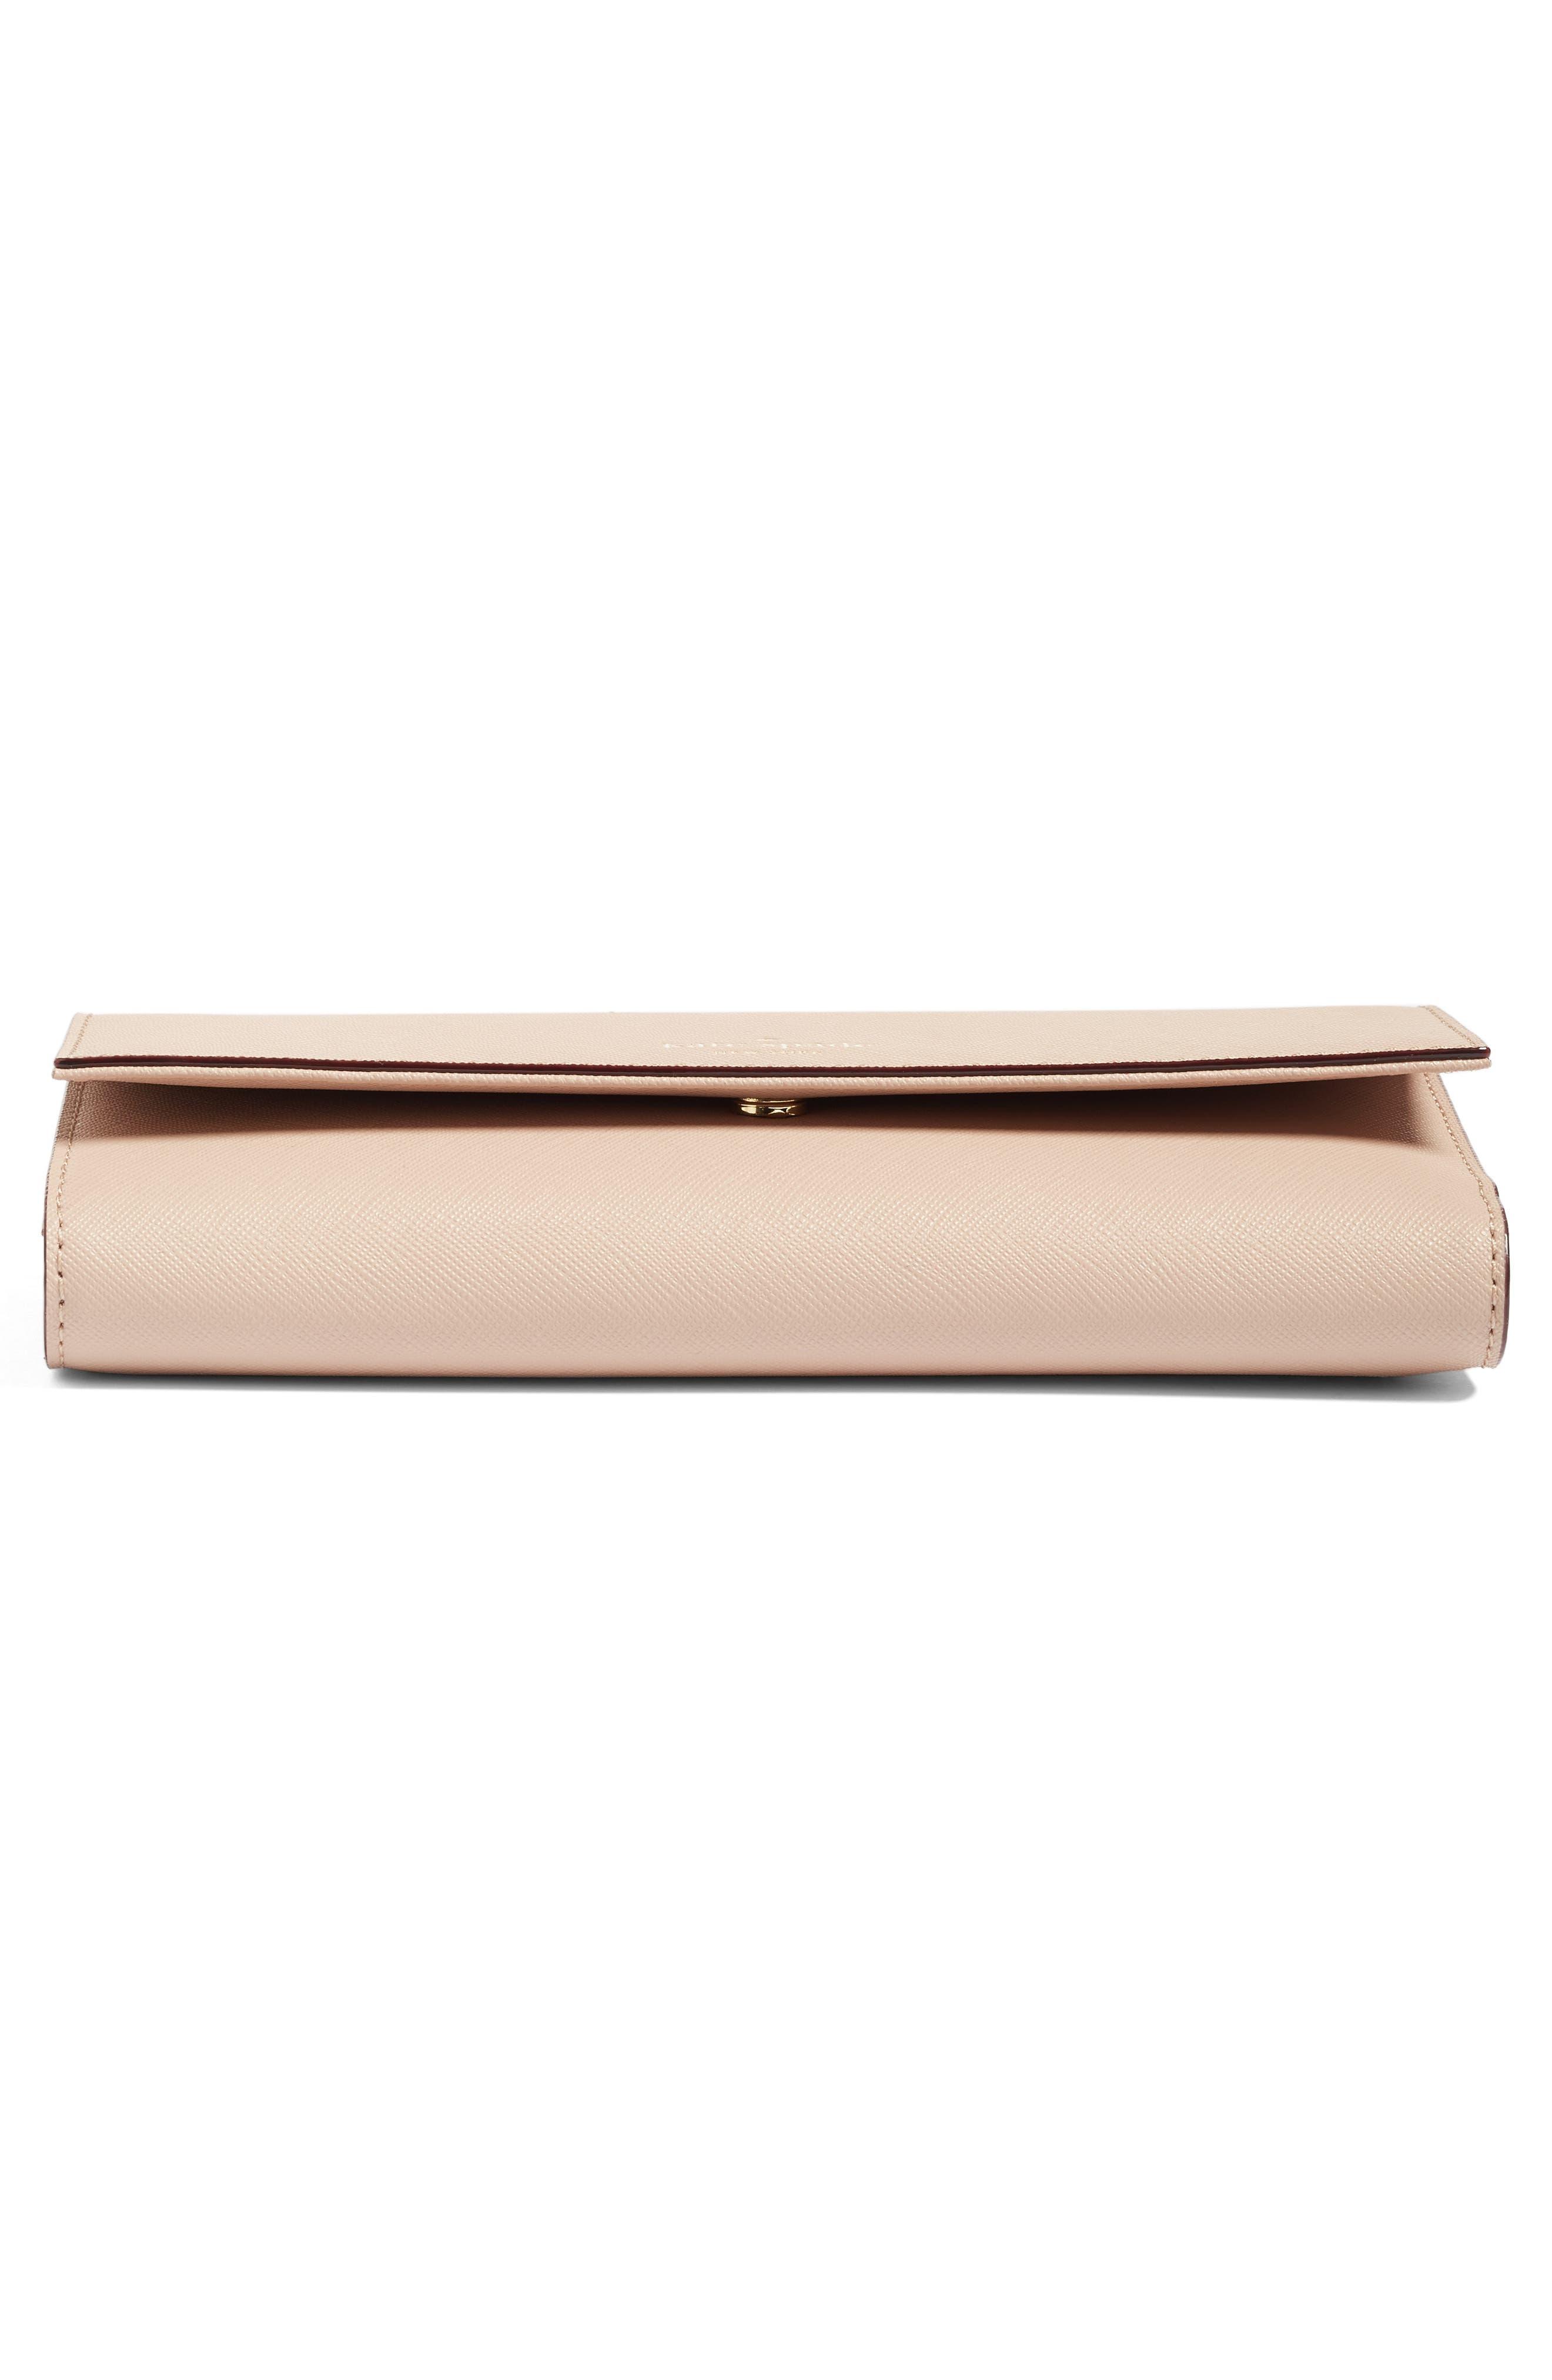 leather iPhone 7/8 & 7/8 Plus case,                             Alternate thumbnail 41, color,